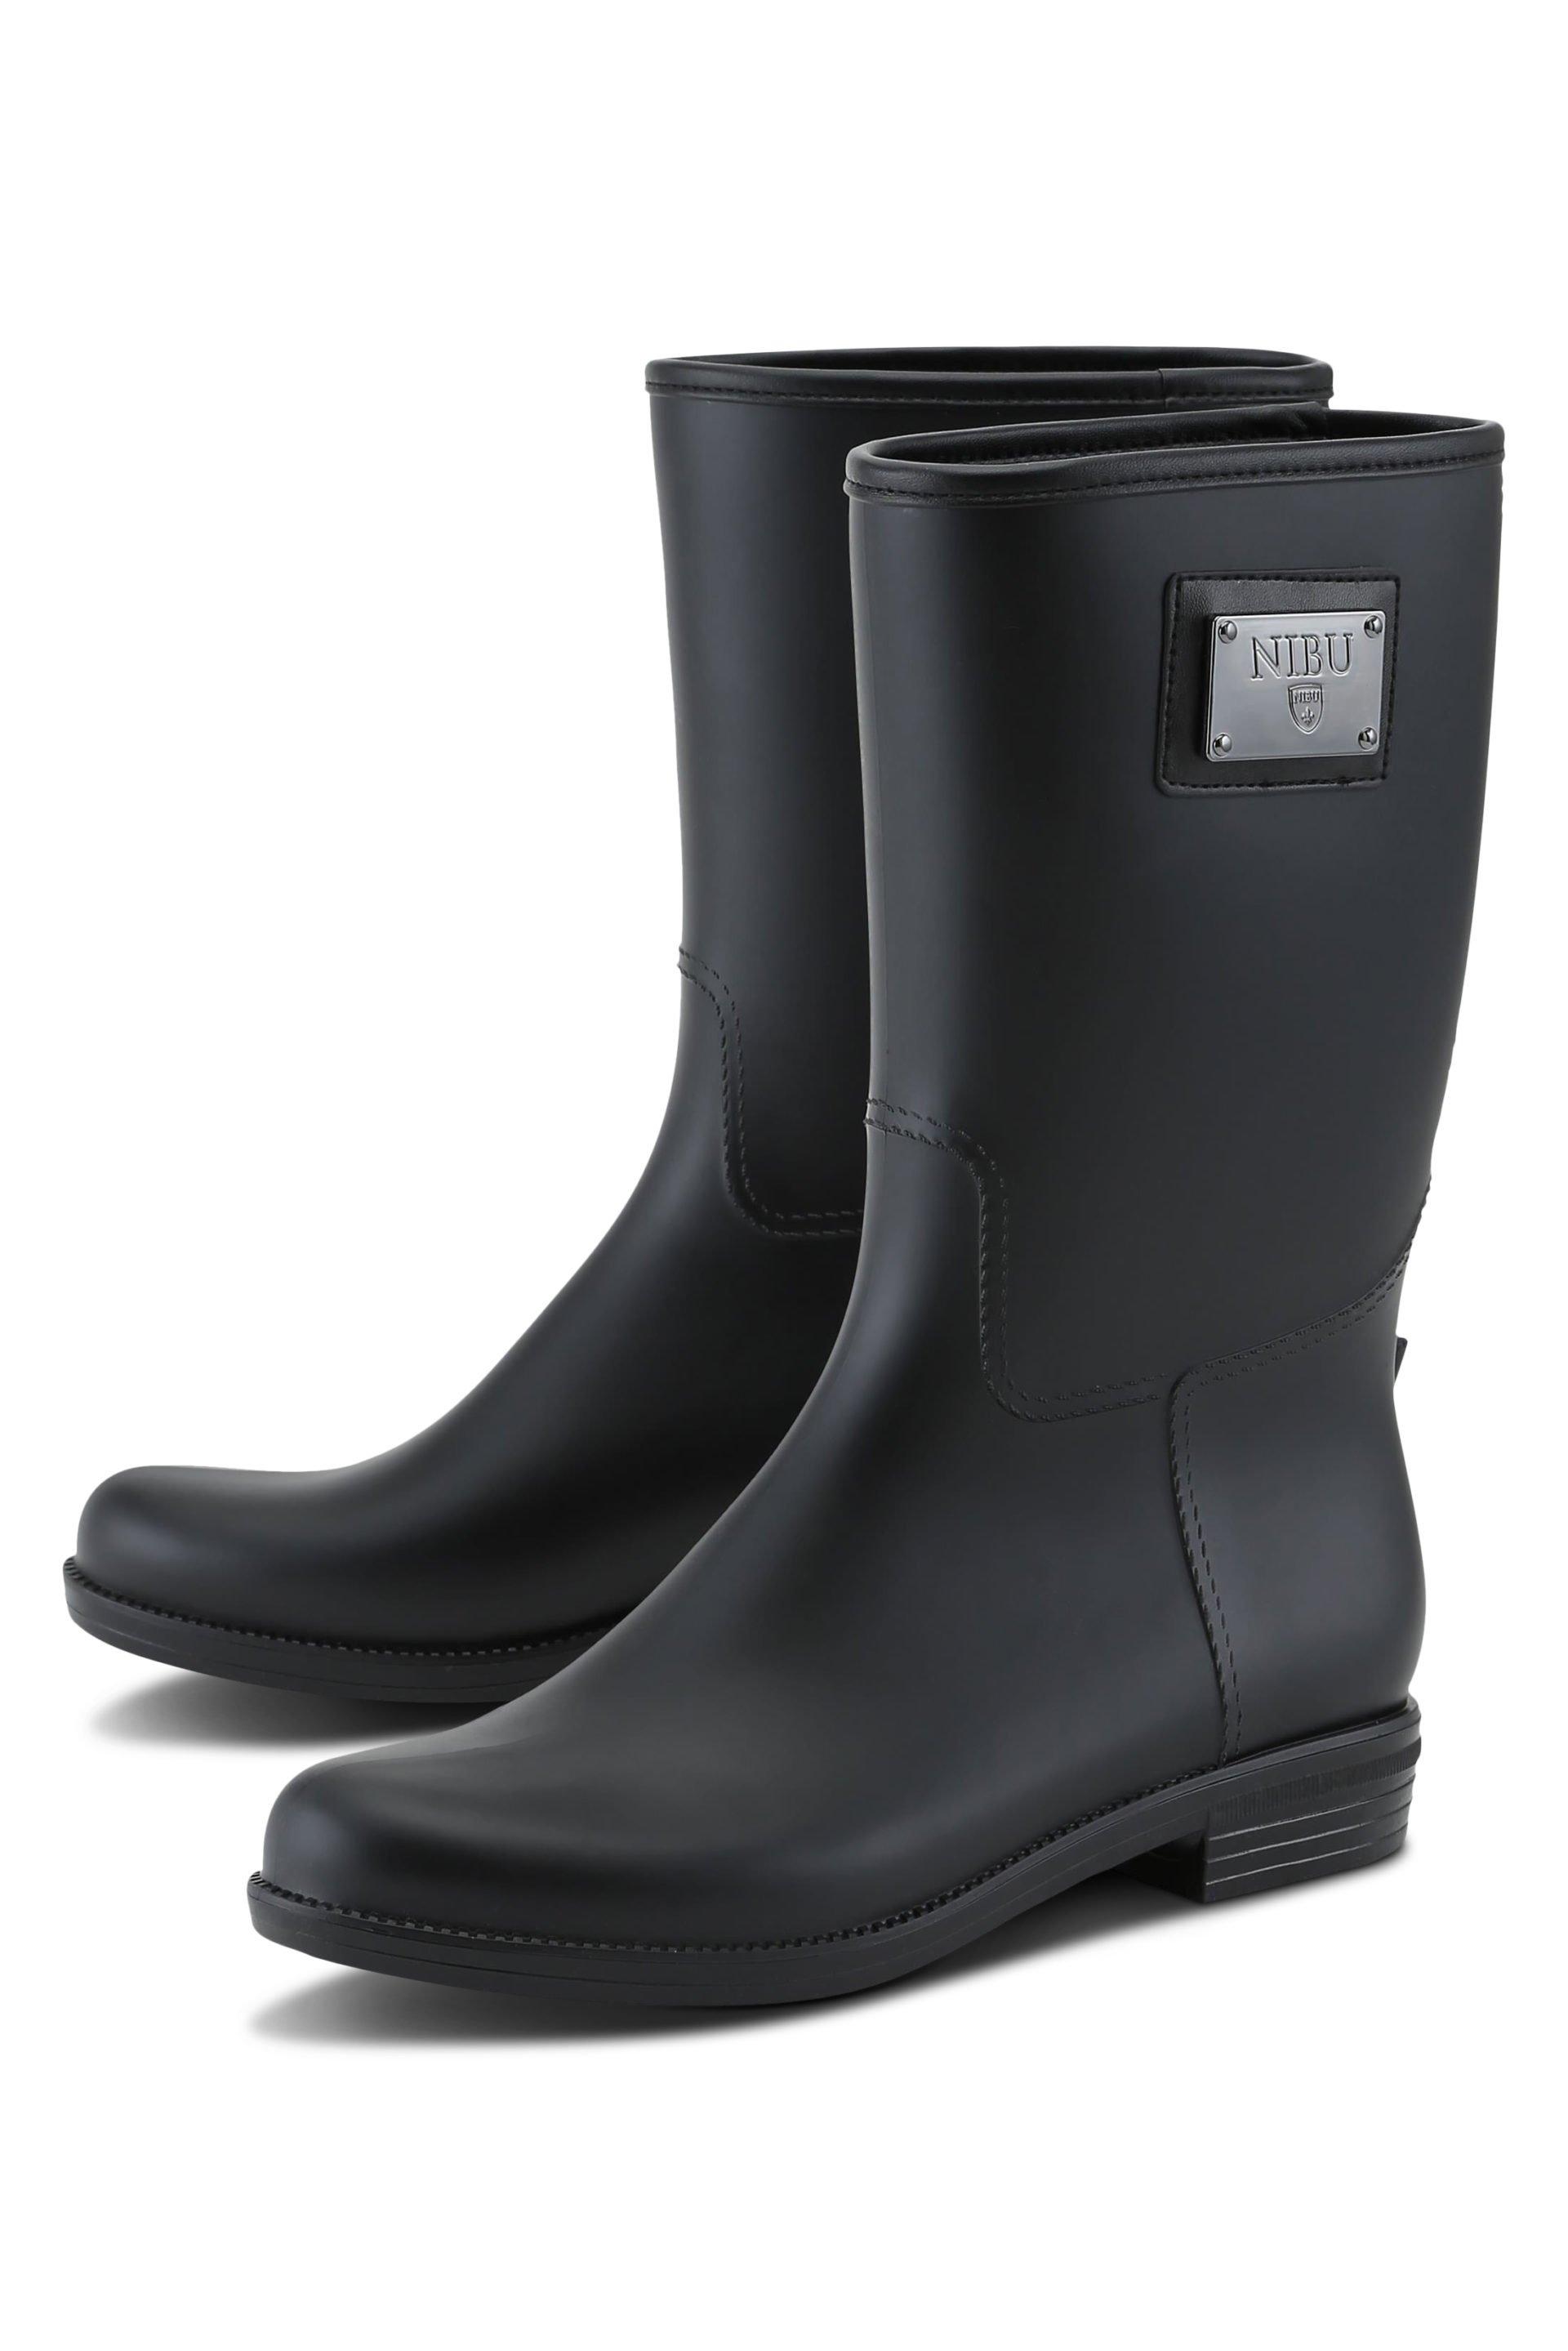 Short rainboots in matte black